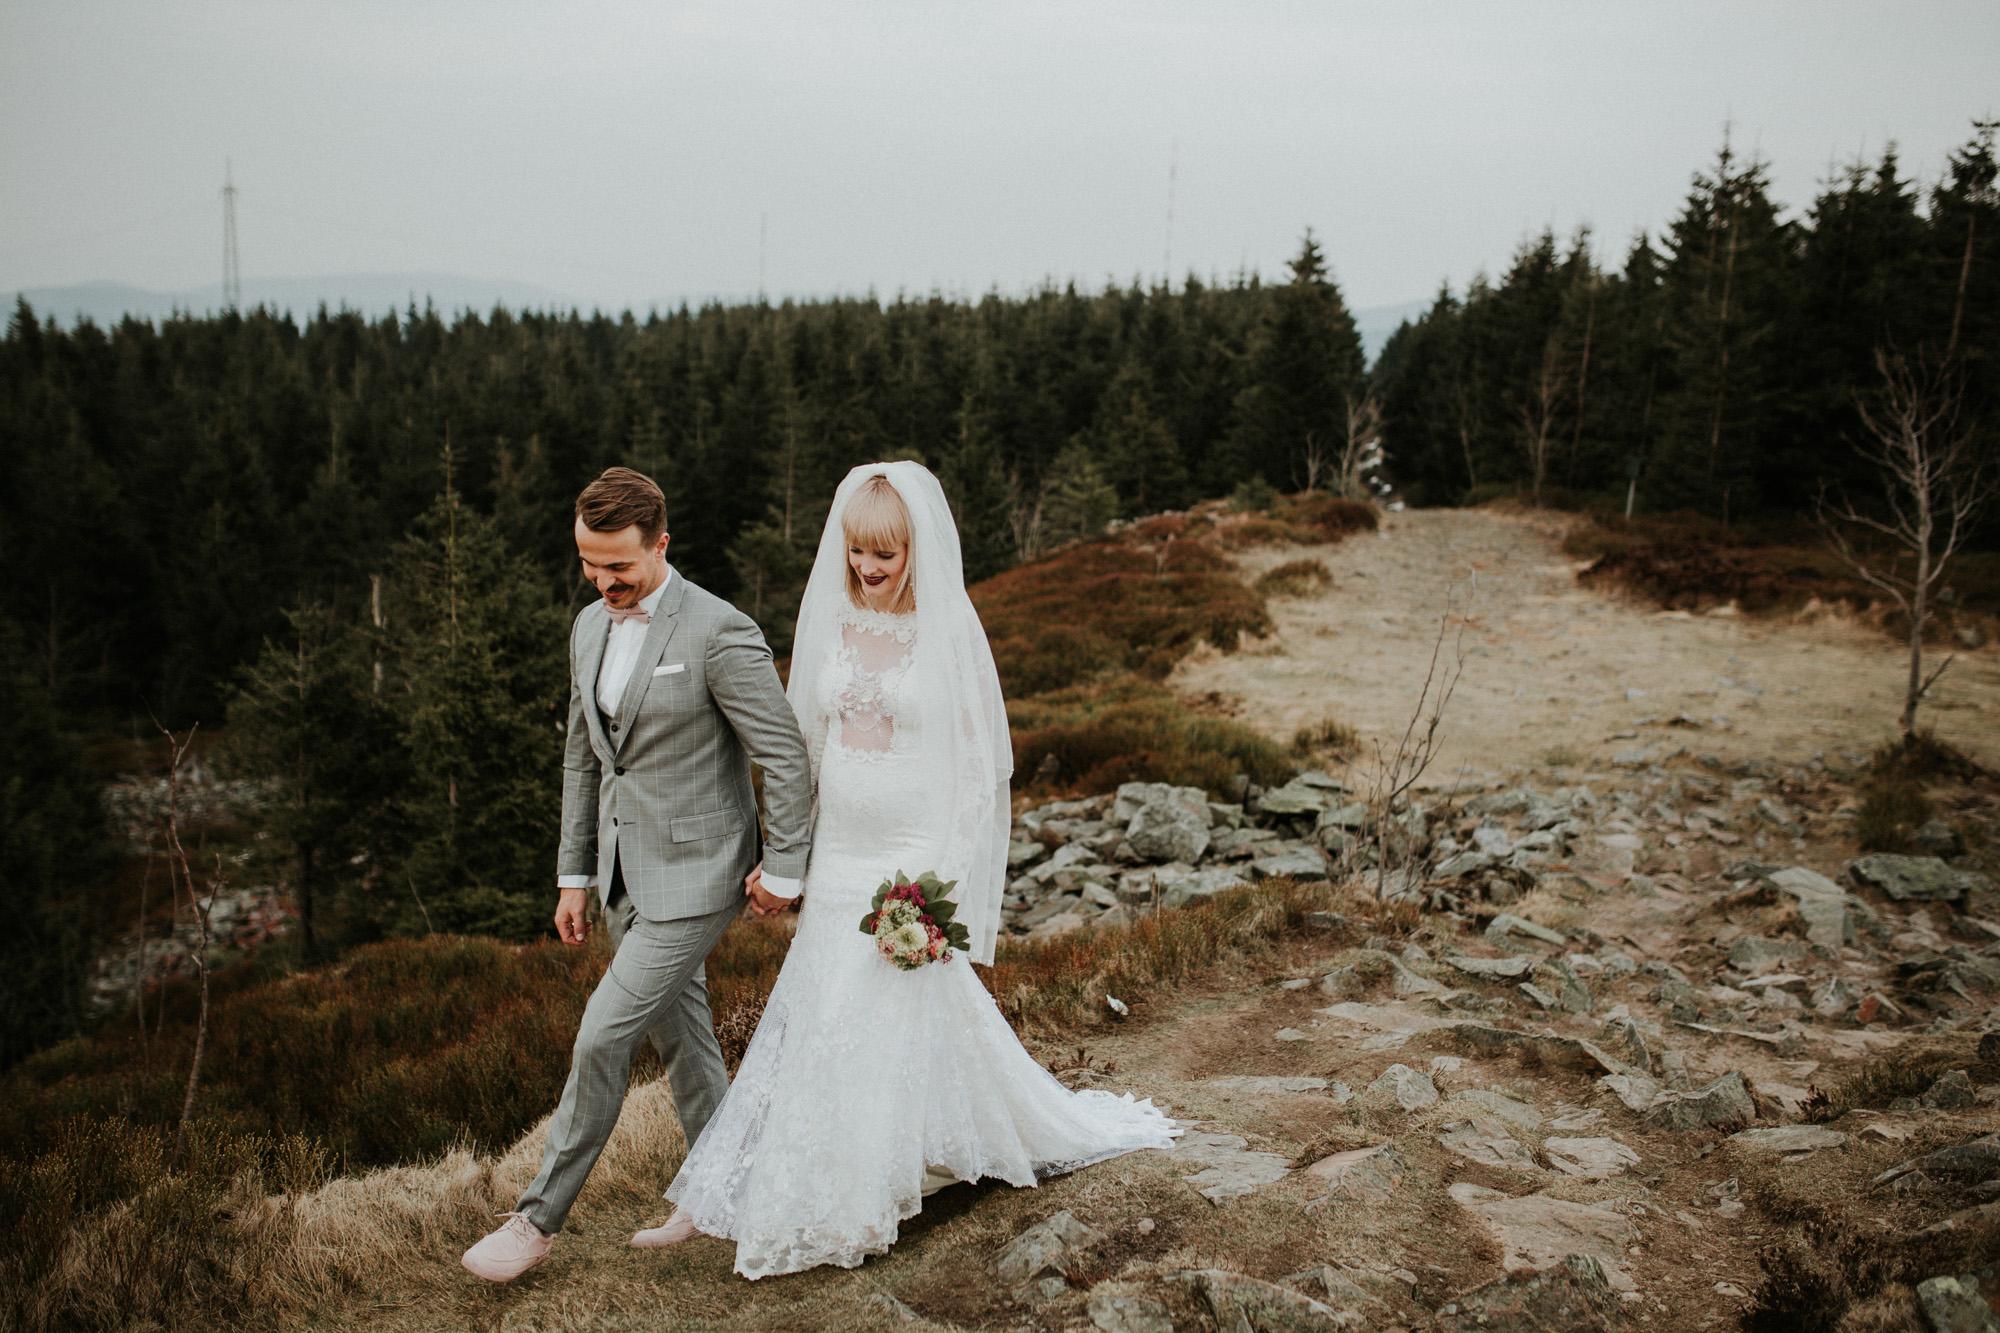 DanielaMarquardtPhotography_Hochzeitsfotograf_Düsseldorf_Köln_Mallorca_Bayern_Austria_Harz_LinaundMaik_Afterwedding-Shooting_Weddingphotographer_Ibiza_Tuskany_Italien_Toskana1